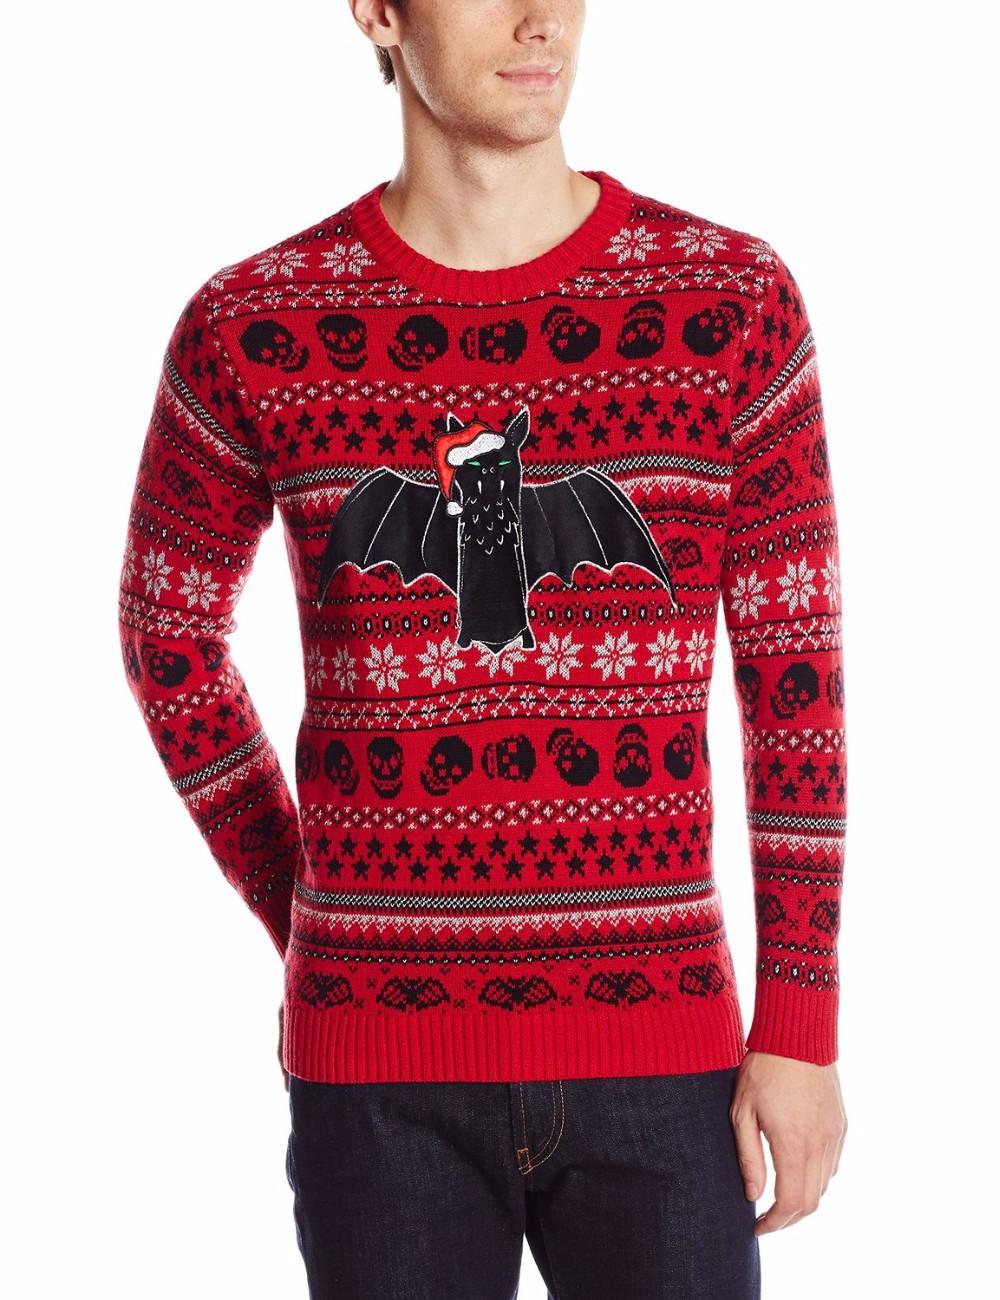 Men Red Sweater Black Bat Pattern Toddler Christmas Boutique ...